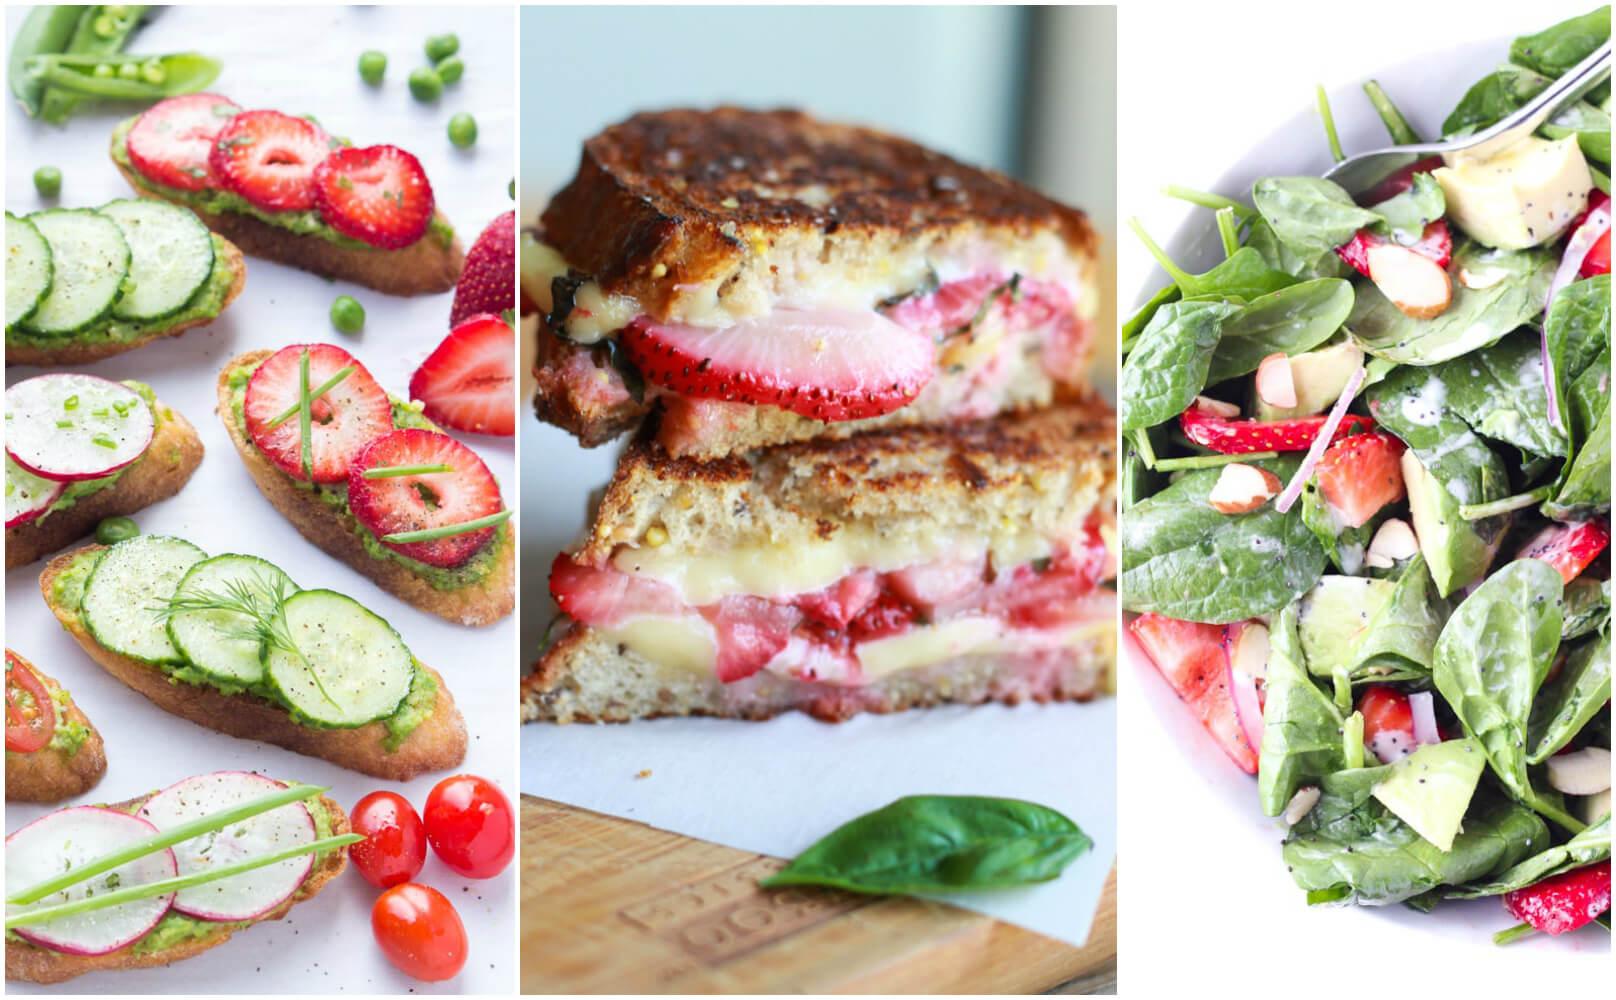 Best strawberry recipes + guide to spring produce | littlebroken.com @littlebroken